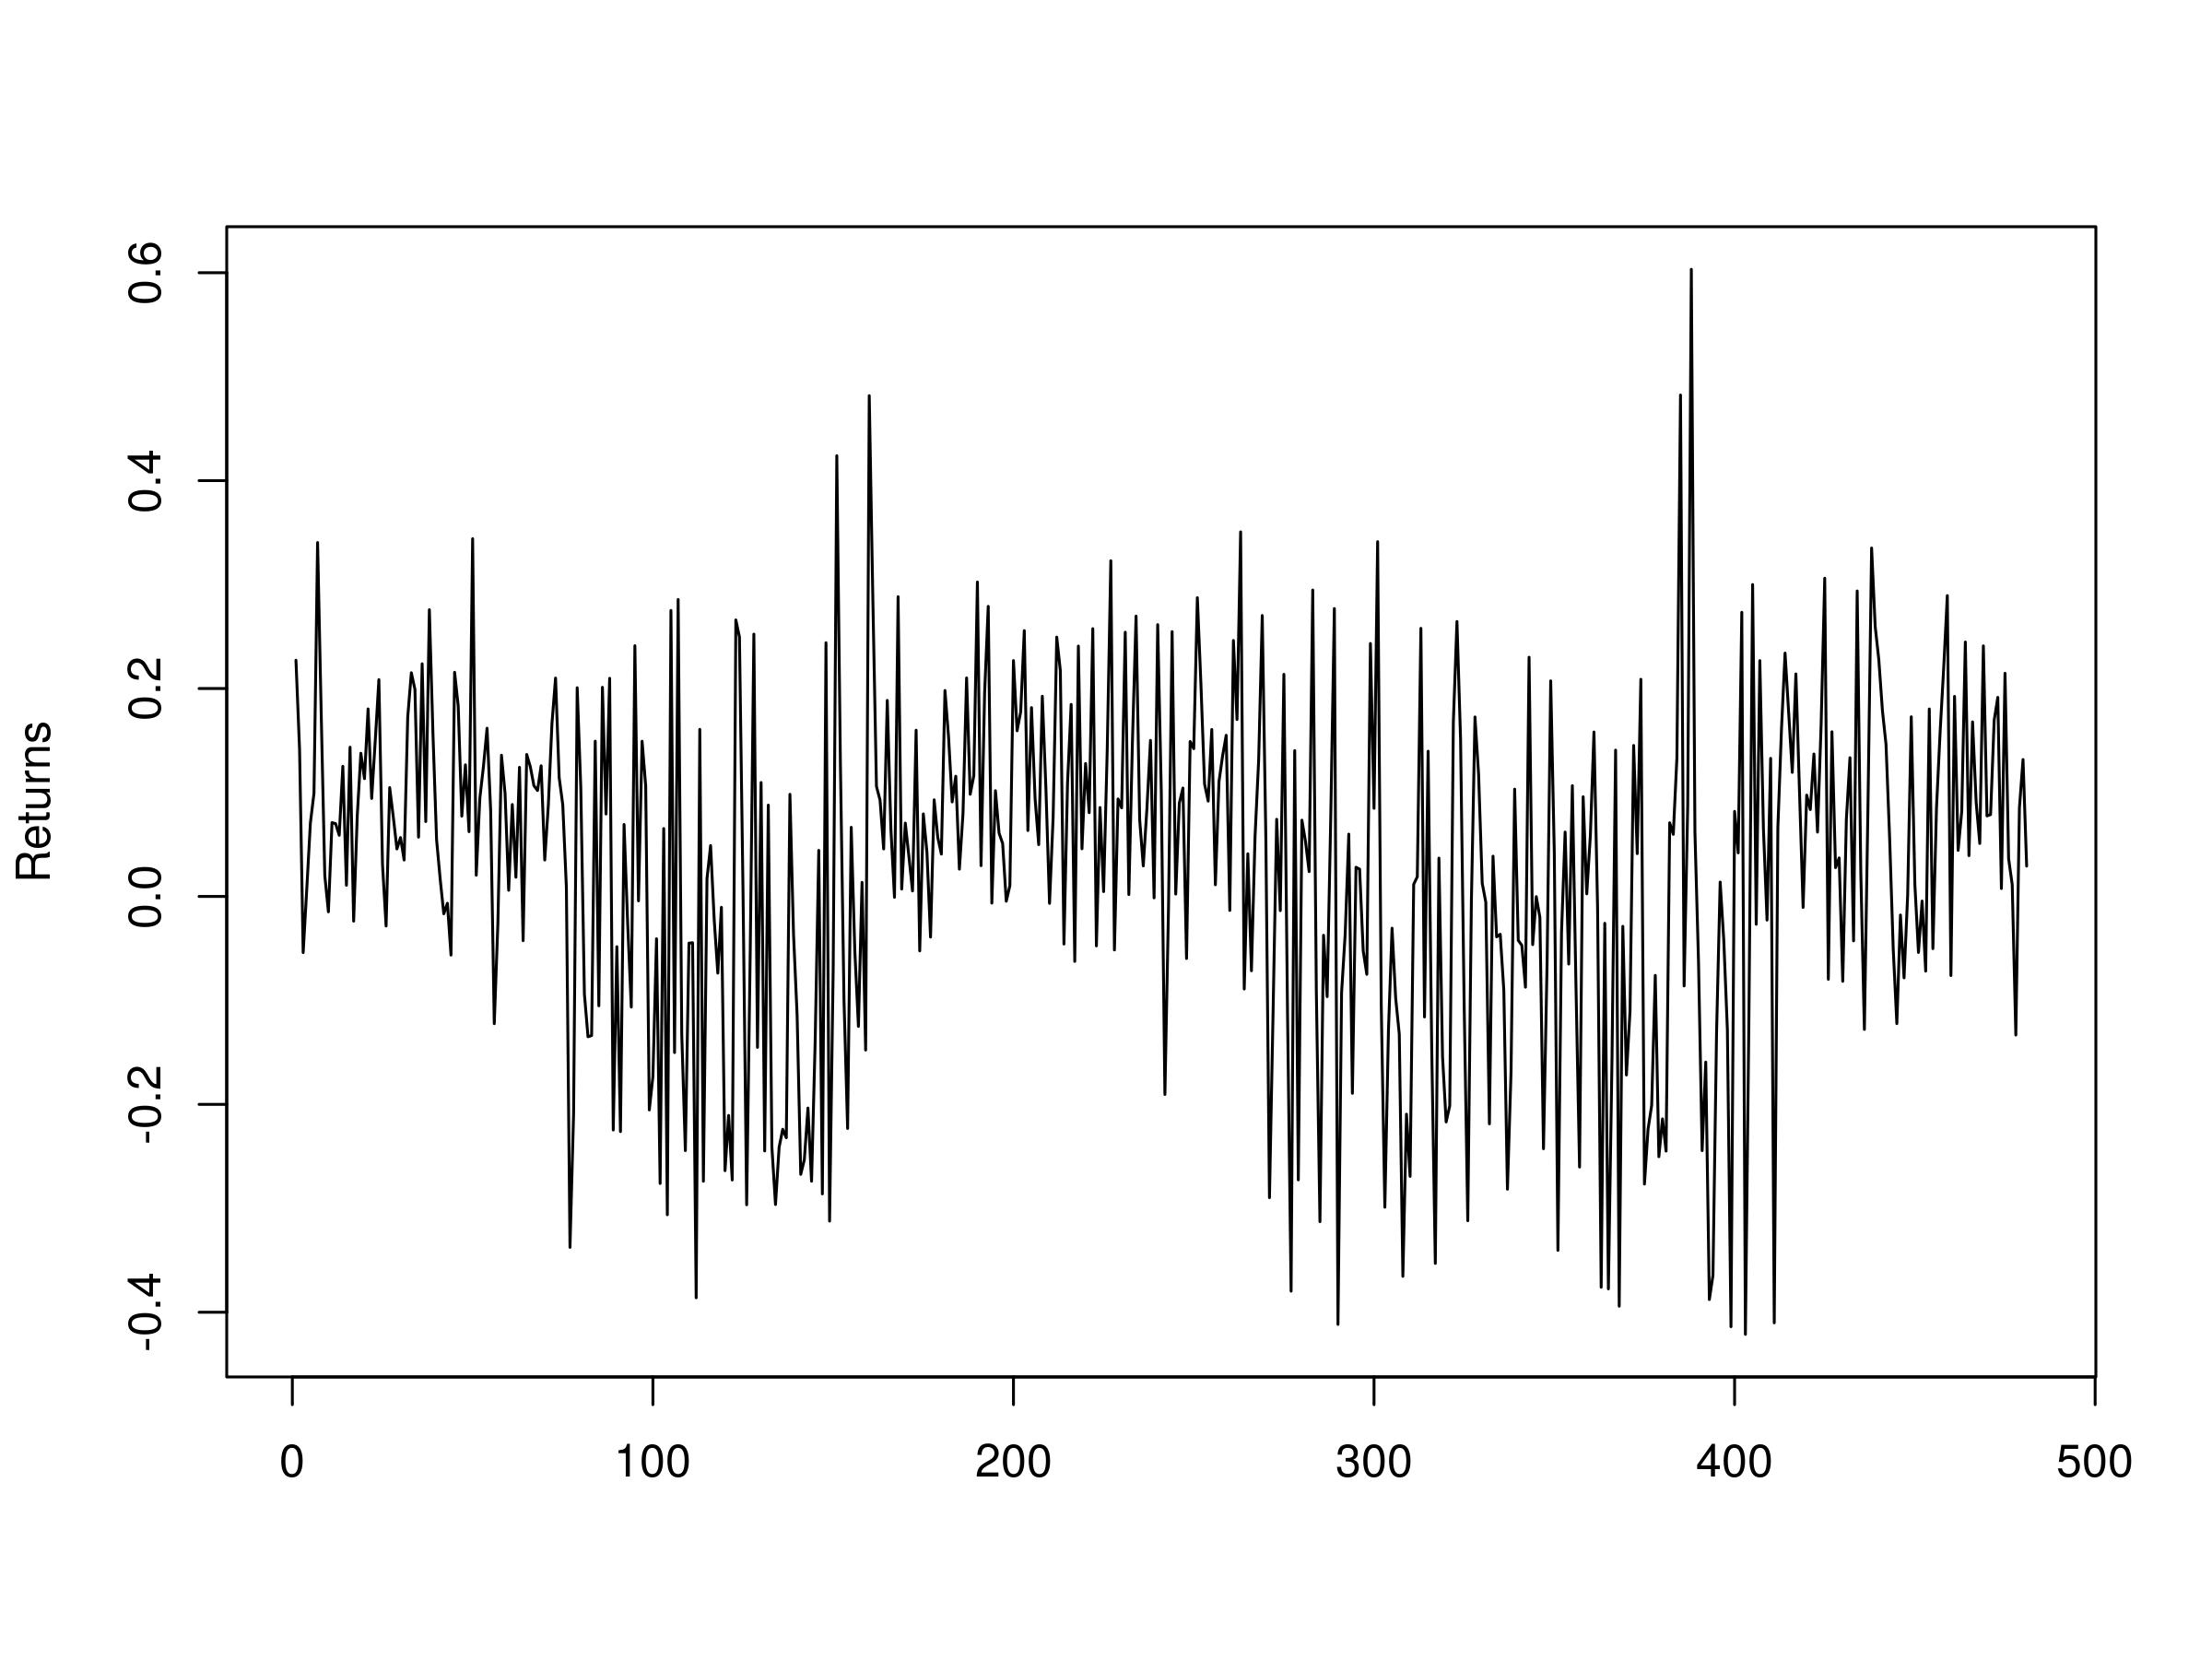 Hidden Markov Models for Regime Detection using R   QuantStart